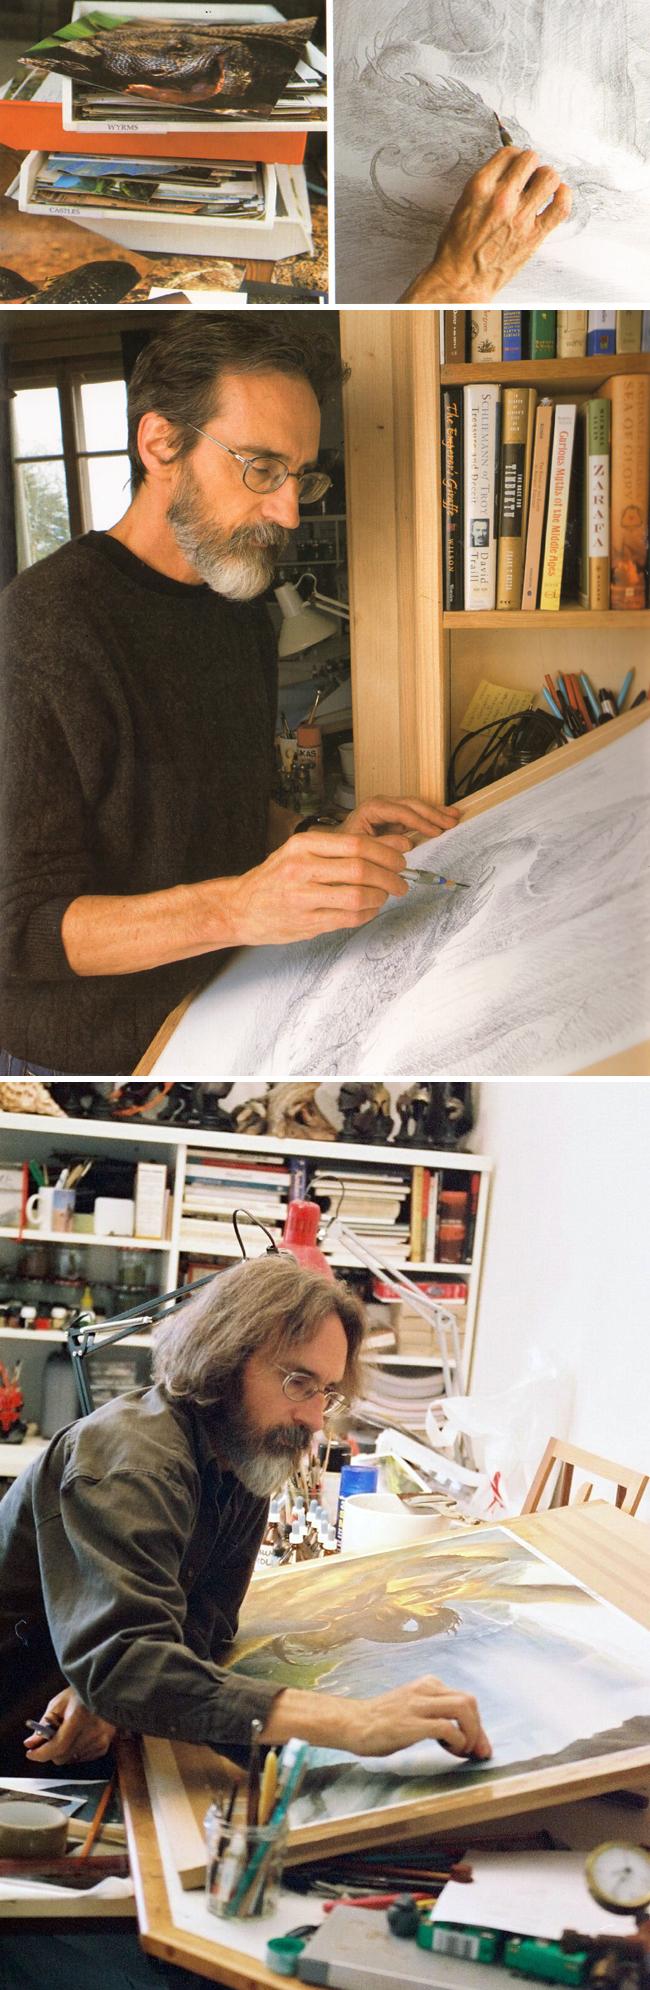 John-Howe-ilustracion-dibujo-comic-academiac10-madrid-18